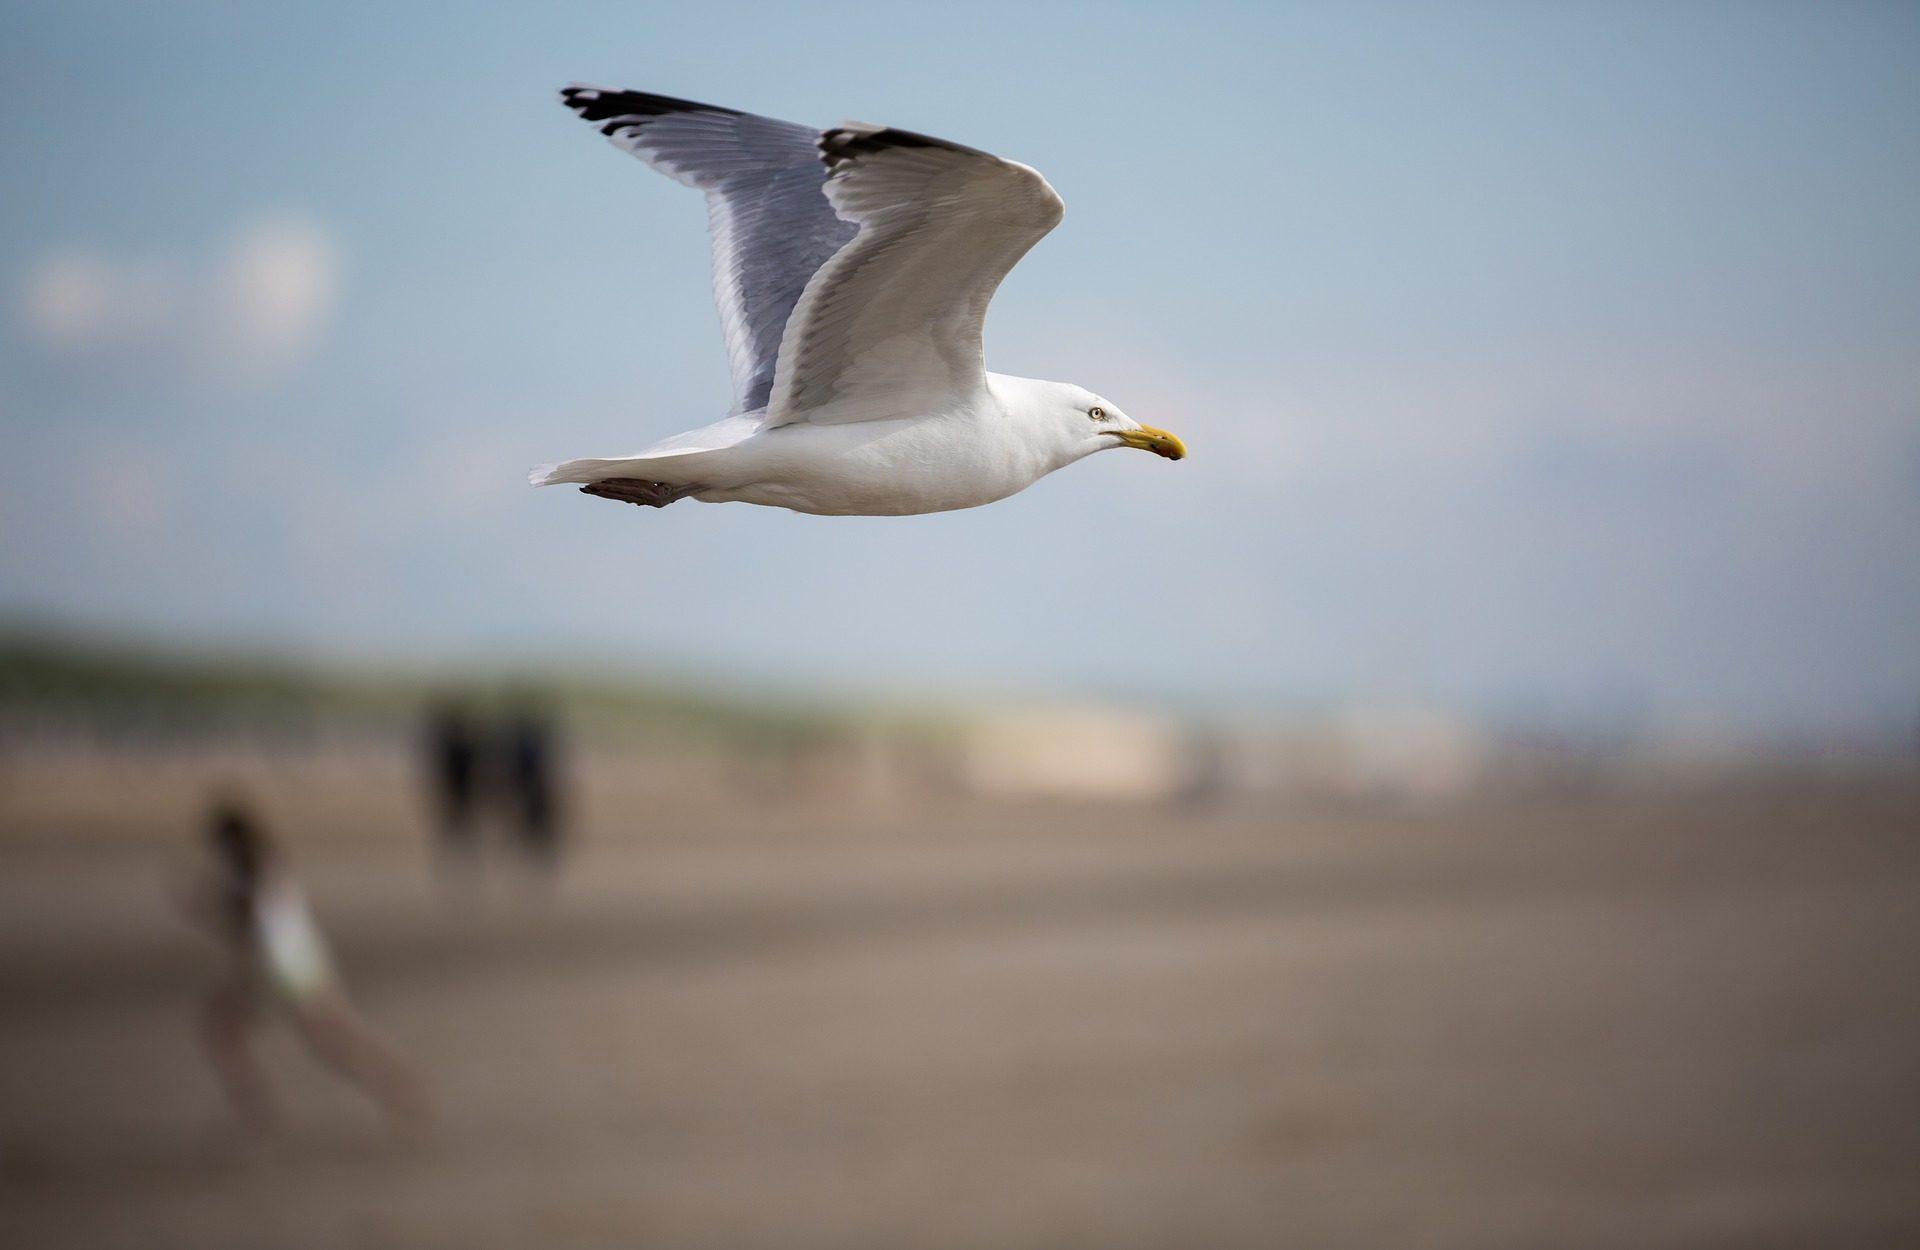 Seagull, Ave, पक्षी, उड़ान, alas, पंख - HD वॉलपेपर - प्रोफेसर-falken.com